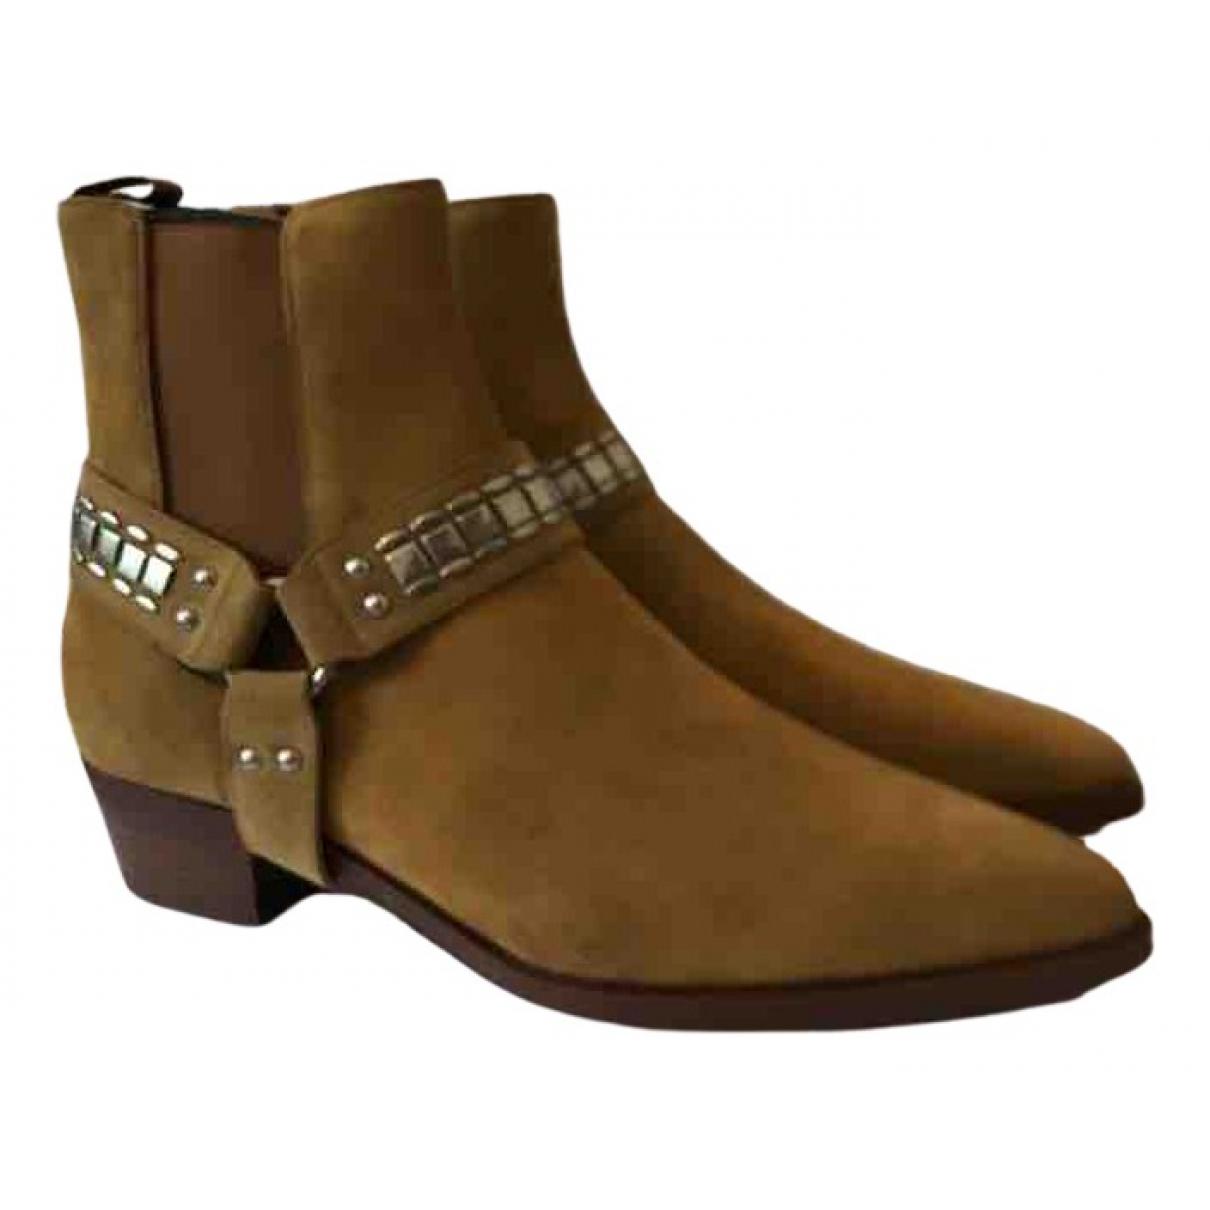 Celine Carmargue boots Stiefel in  Beige Veloursleder